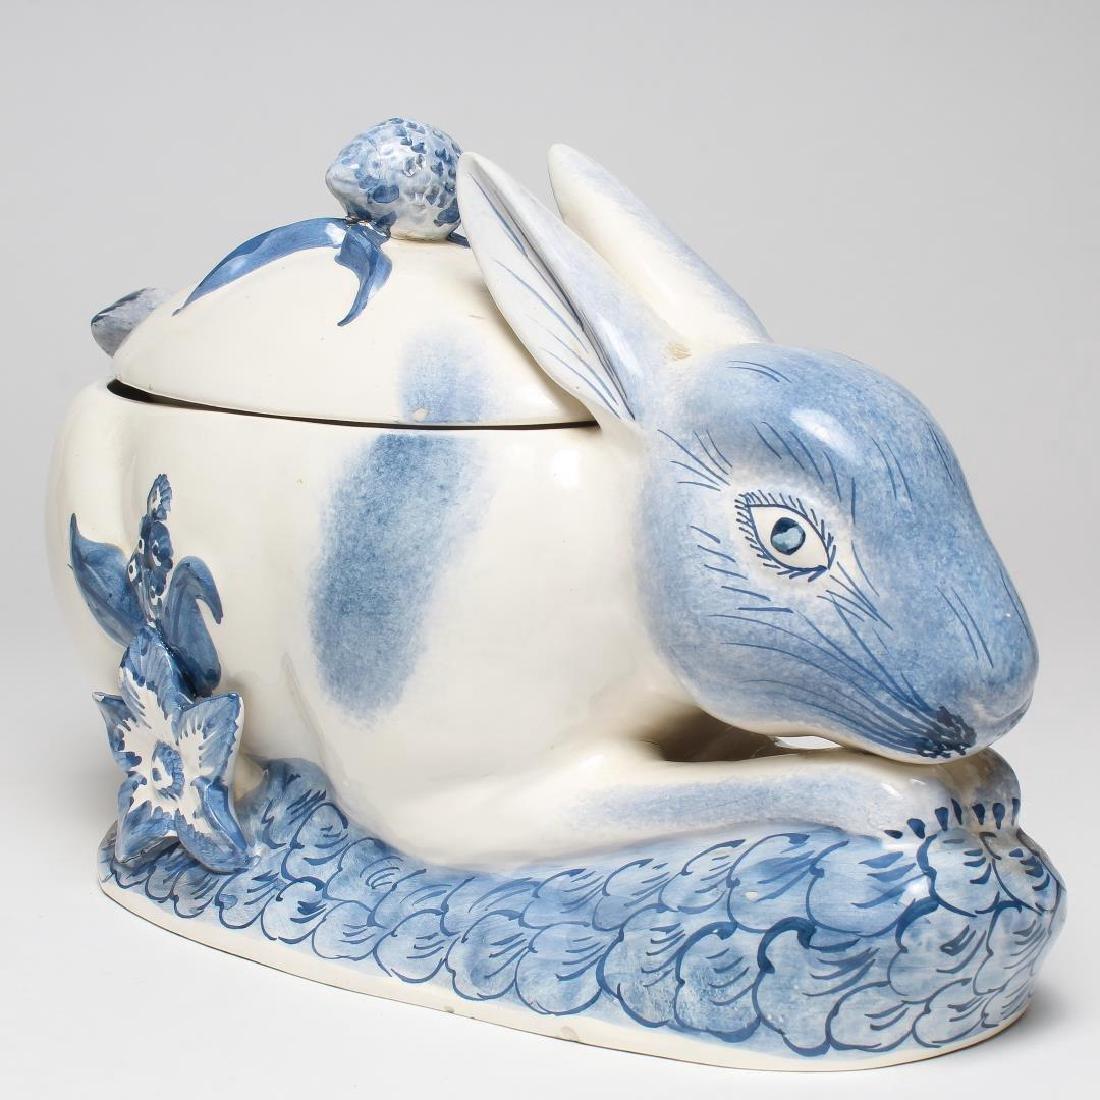 Italian Porcelain Rabbit-Form Tureen & Ladle - 2